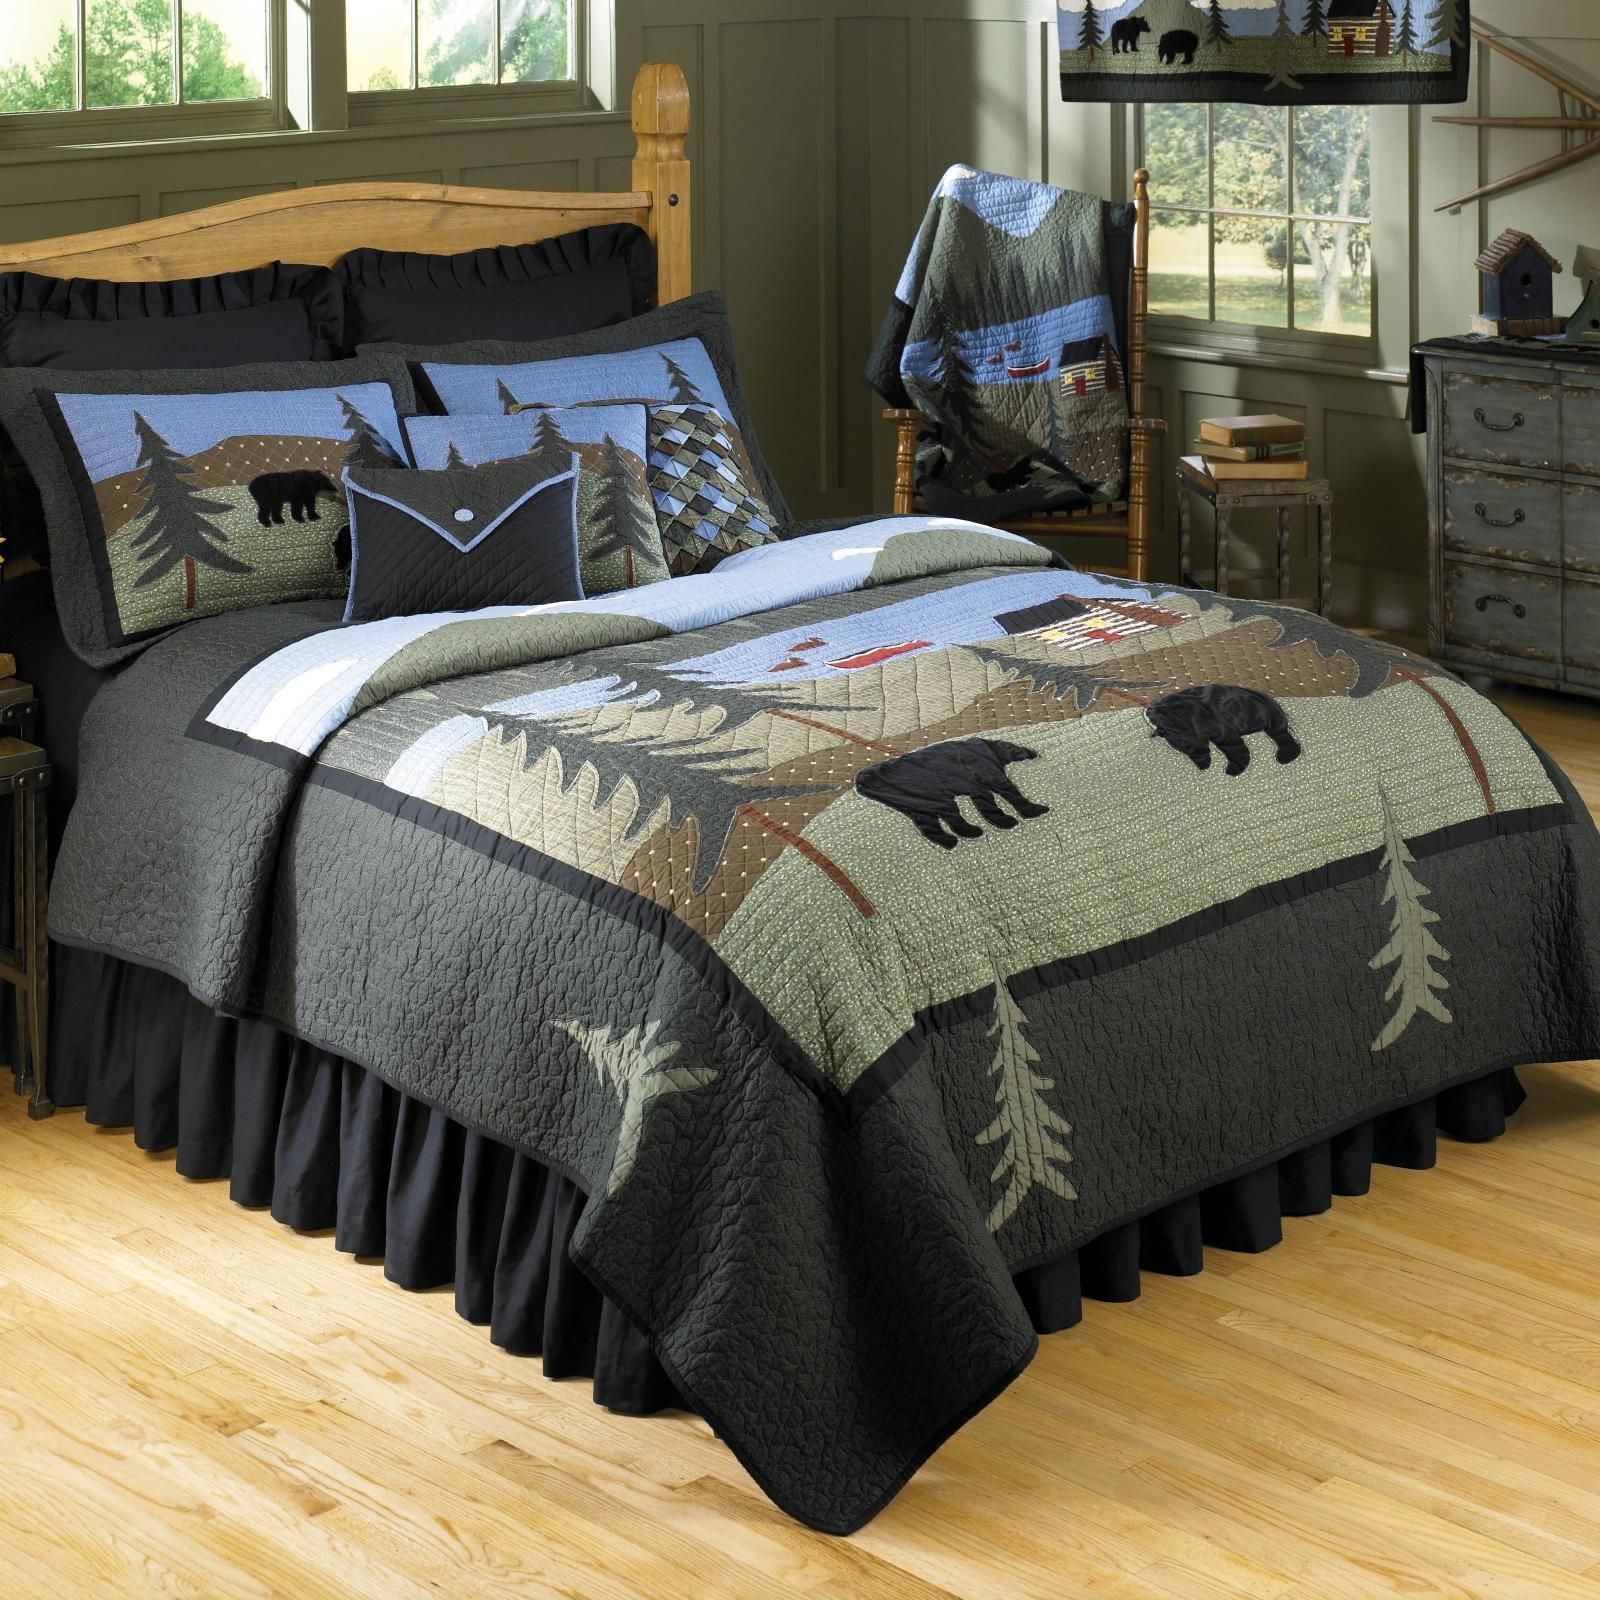 twin bear piece bed cabins set bedding beatrice comforters elk zion rustic cabin deer sets comforter lodge bath pin